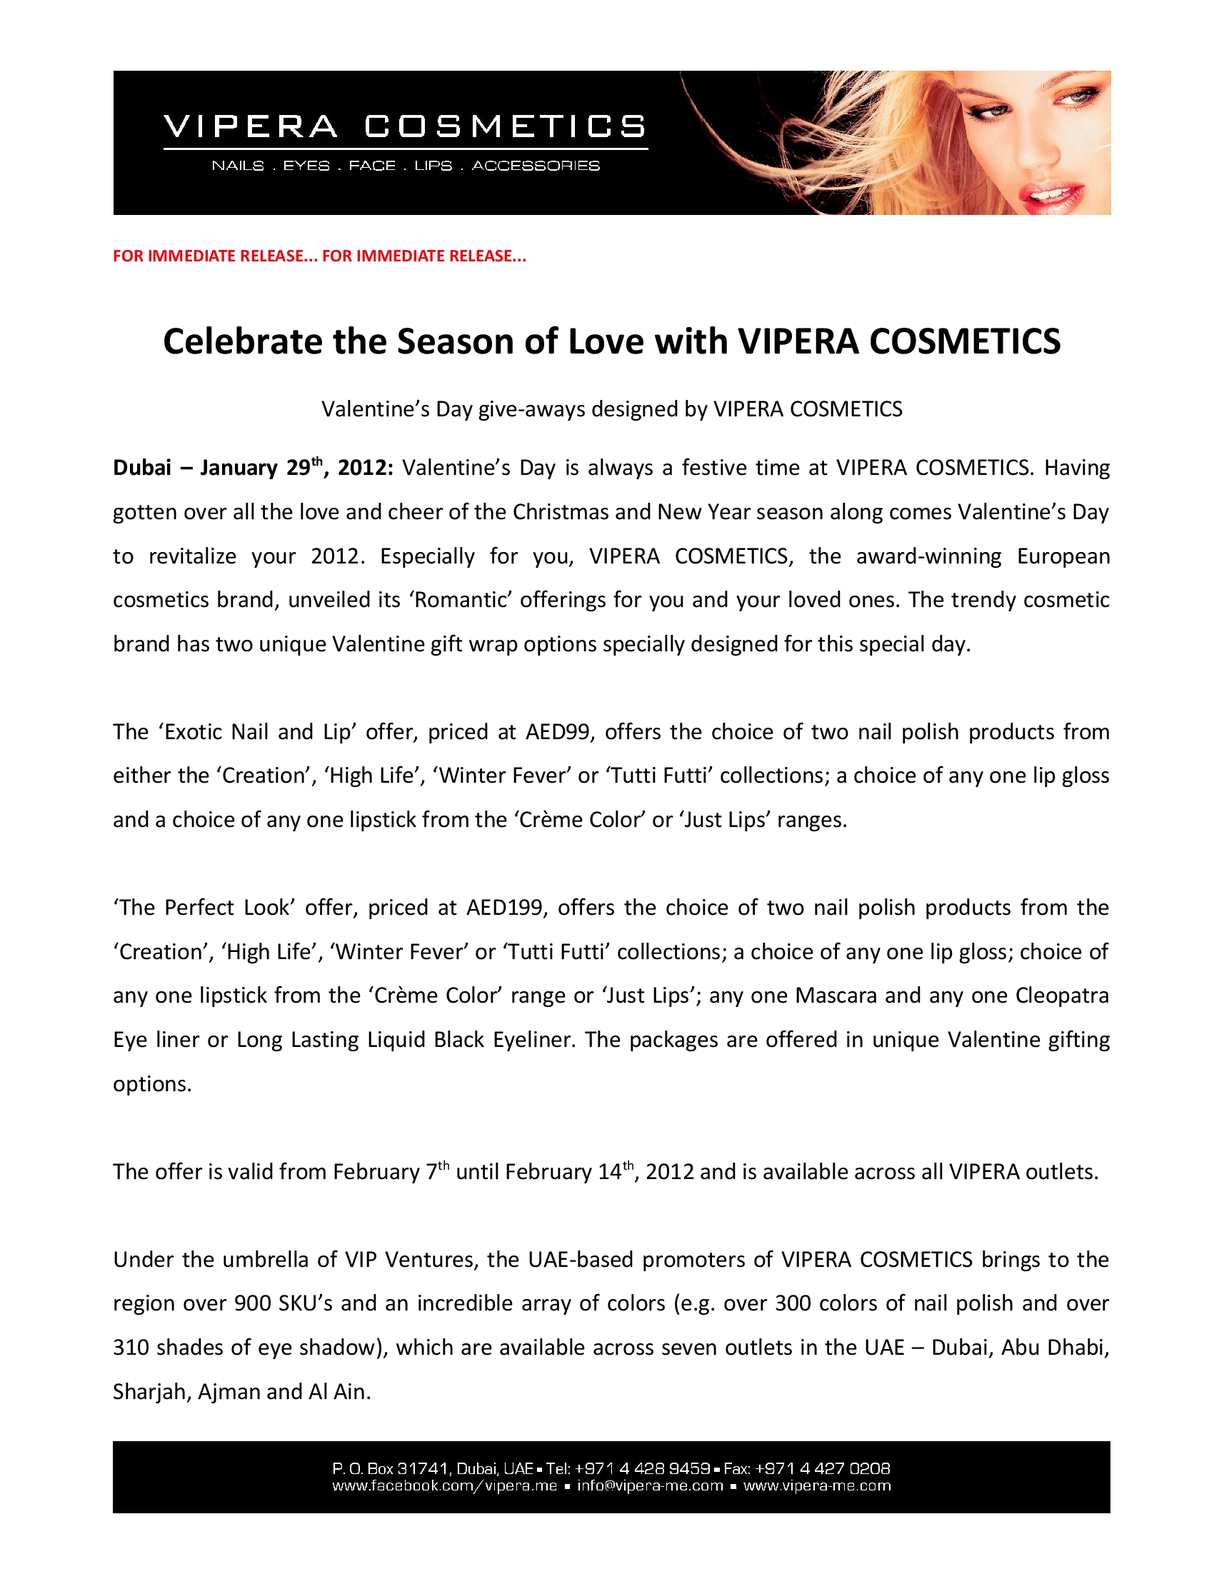 Calaméo - Celebrate the Season of Love with VIPERA COSMETICS